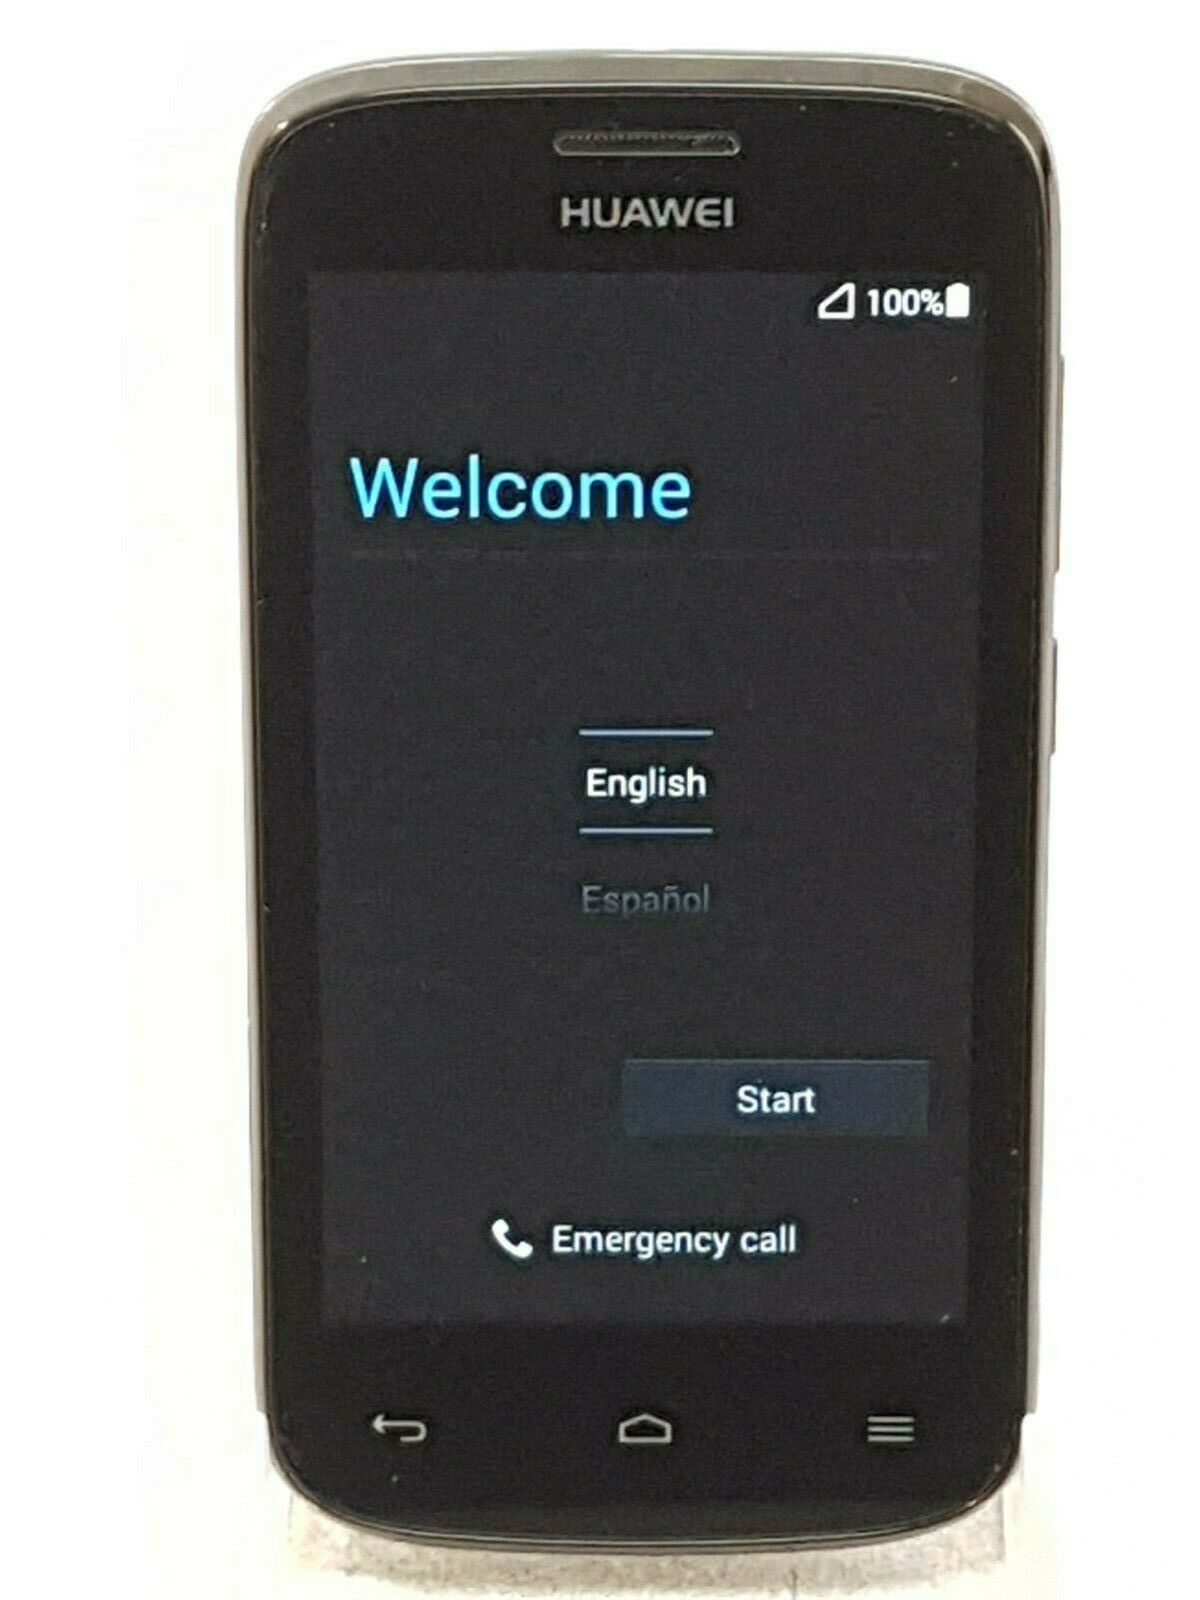 Huawei Vision 2 Y336-a1 Consumer Cellular Black Prepaid Clean ESN for sale  online   eBay